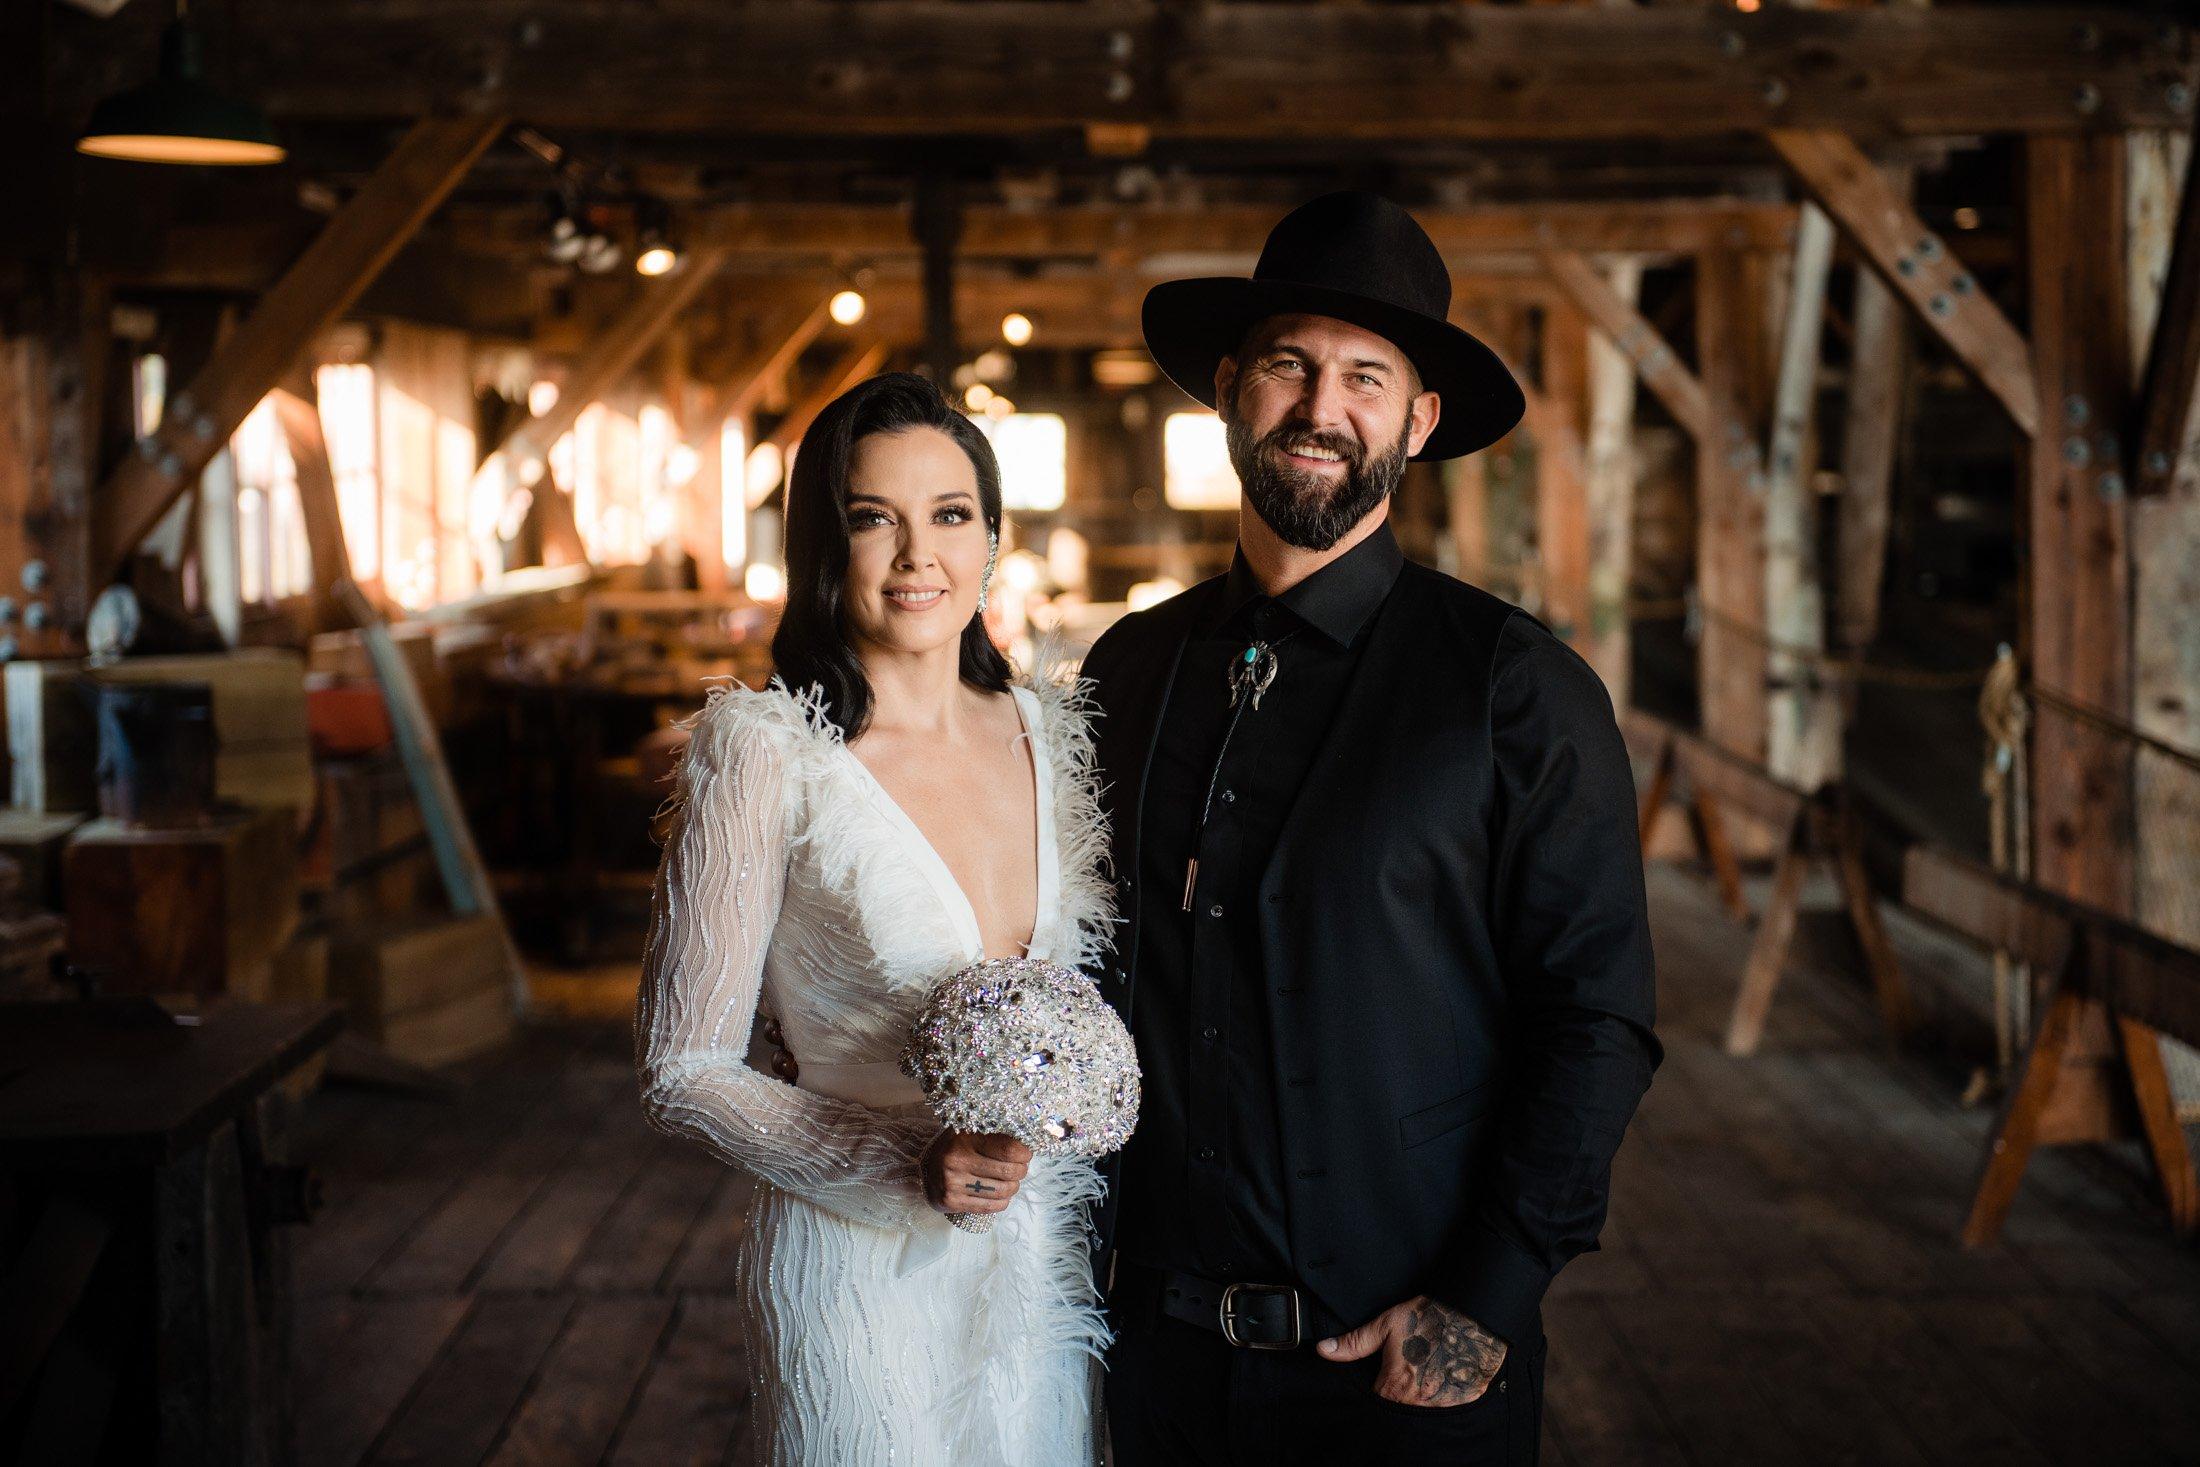 013 - alternative bride and groom